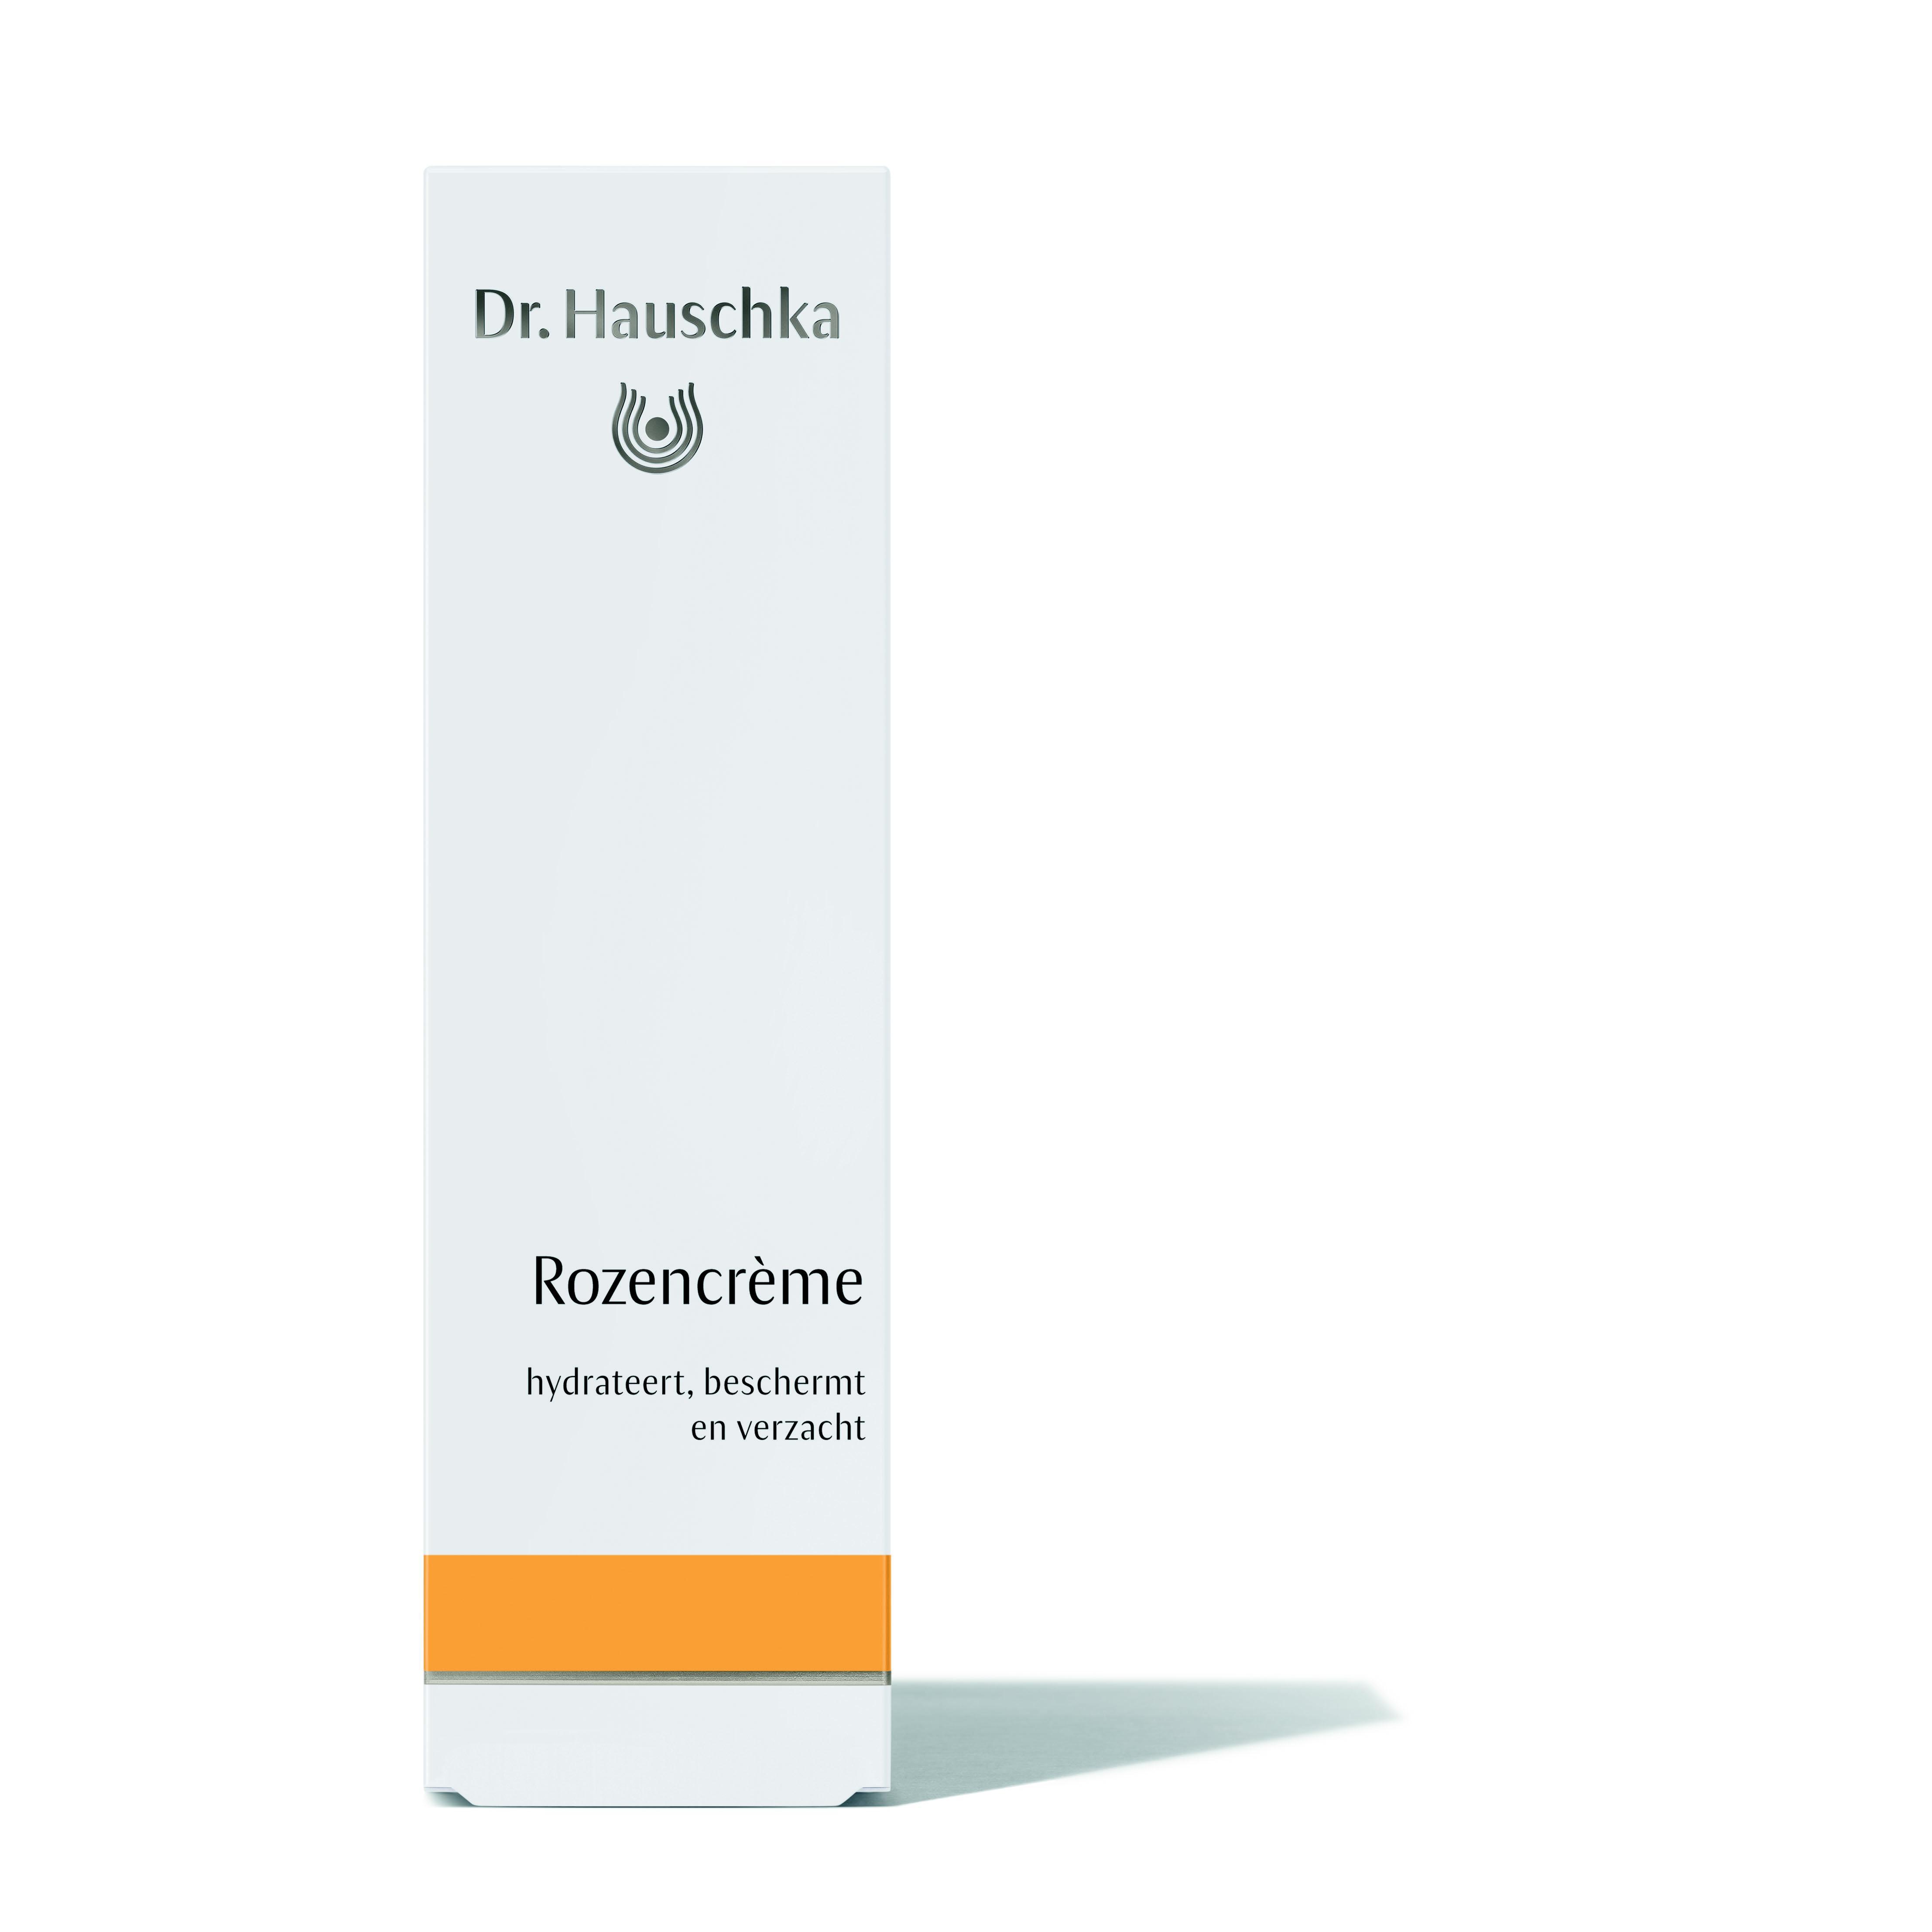 Dr Hauschka Rozencreme 30 ml creme